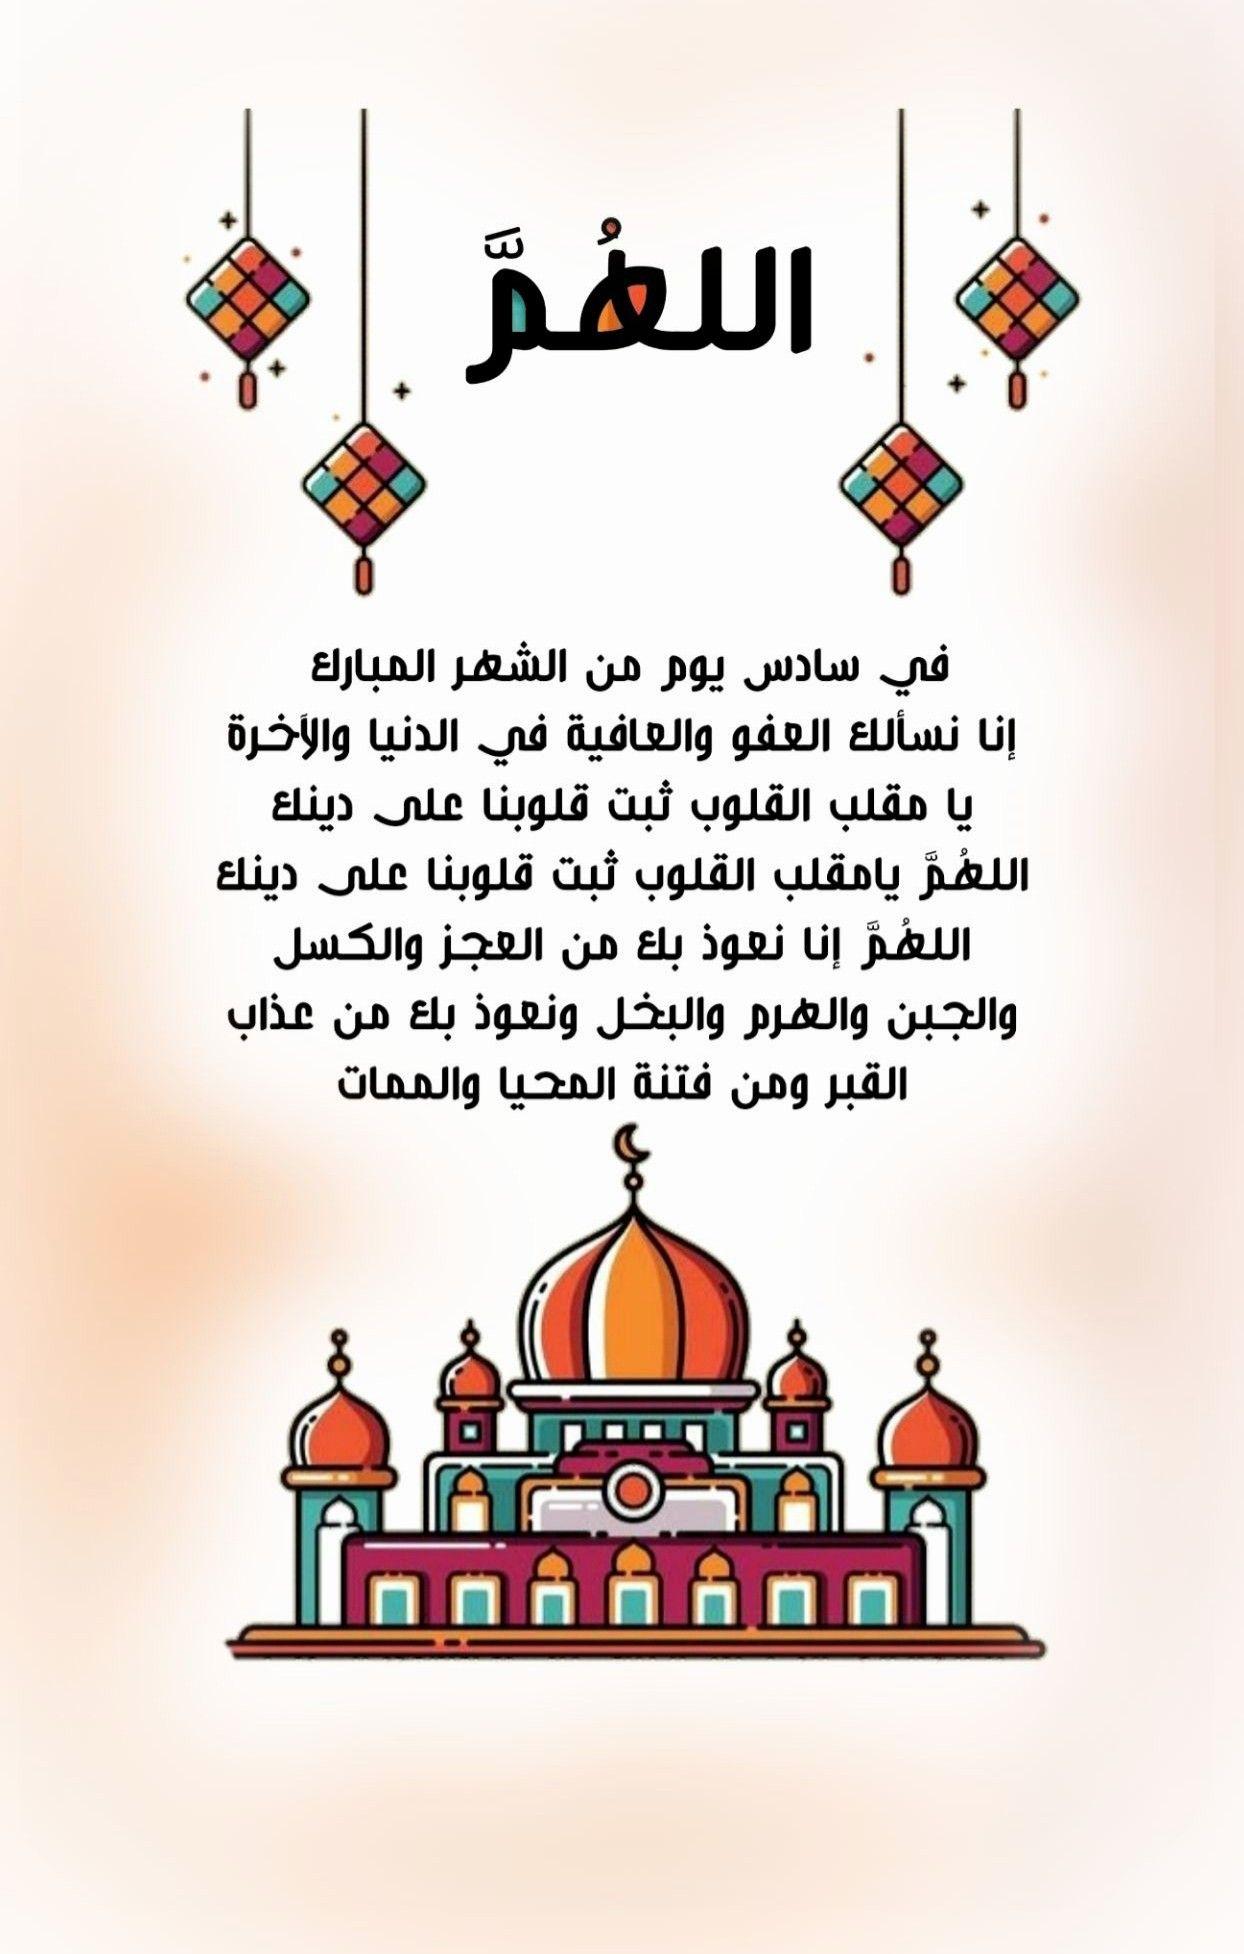 Pin By Nada M On رمضان ثلاثون نورا In 2020 Ramadan Quotes Ramadan Ramadan Kareem